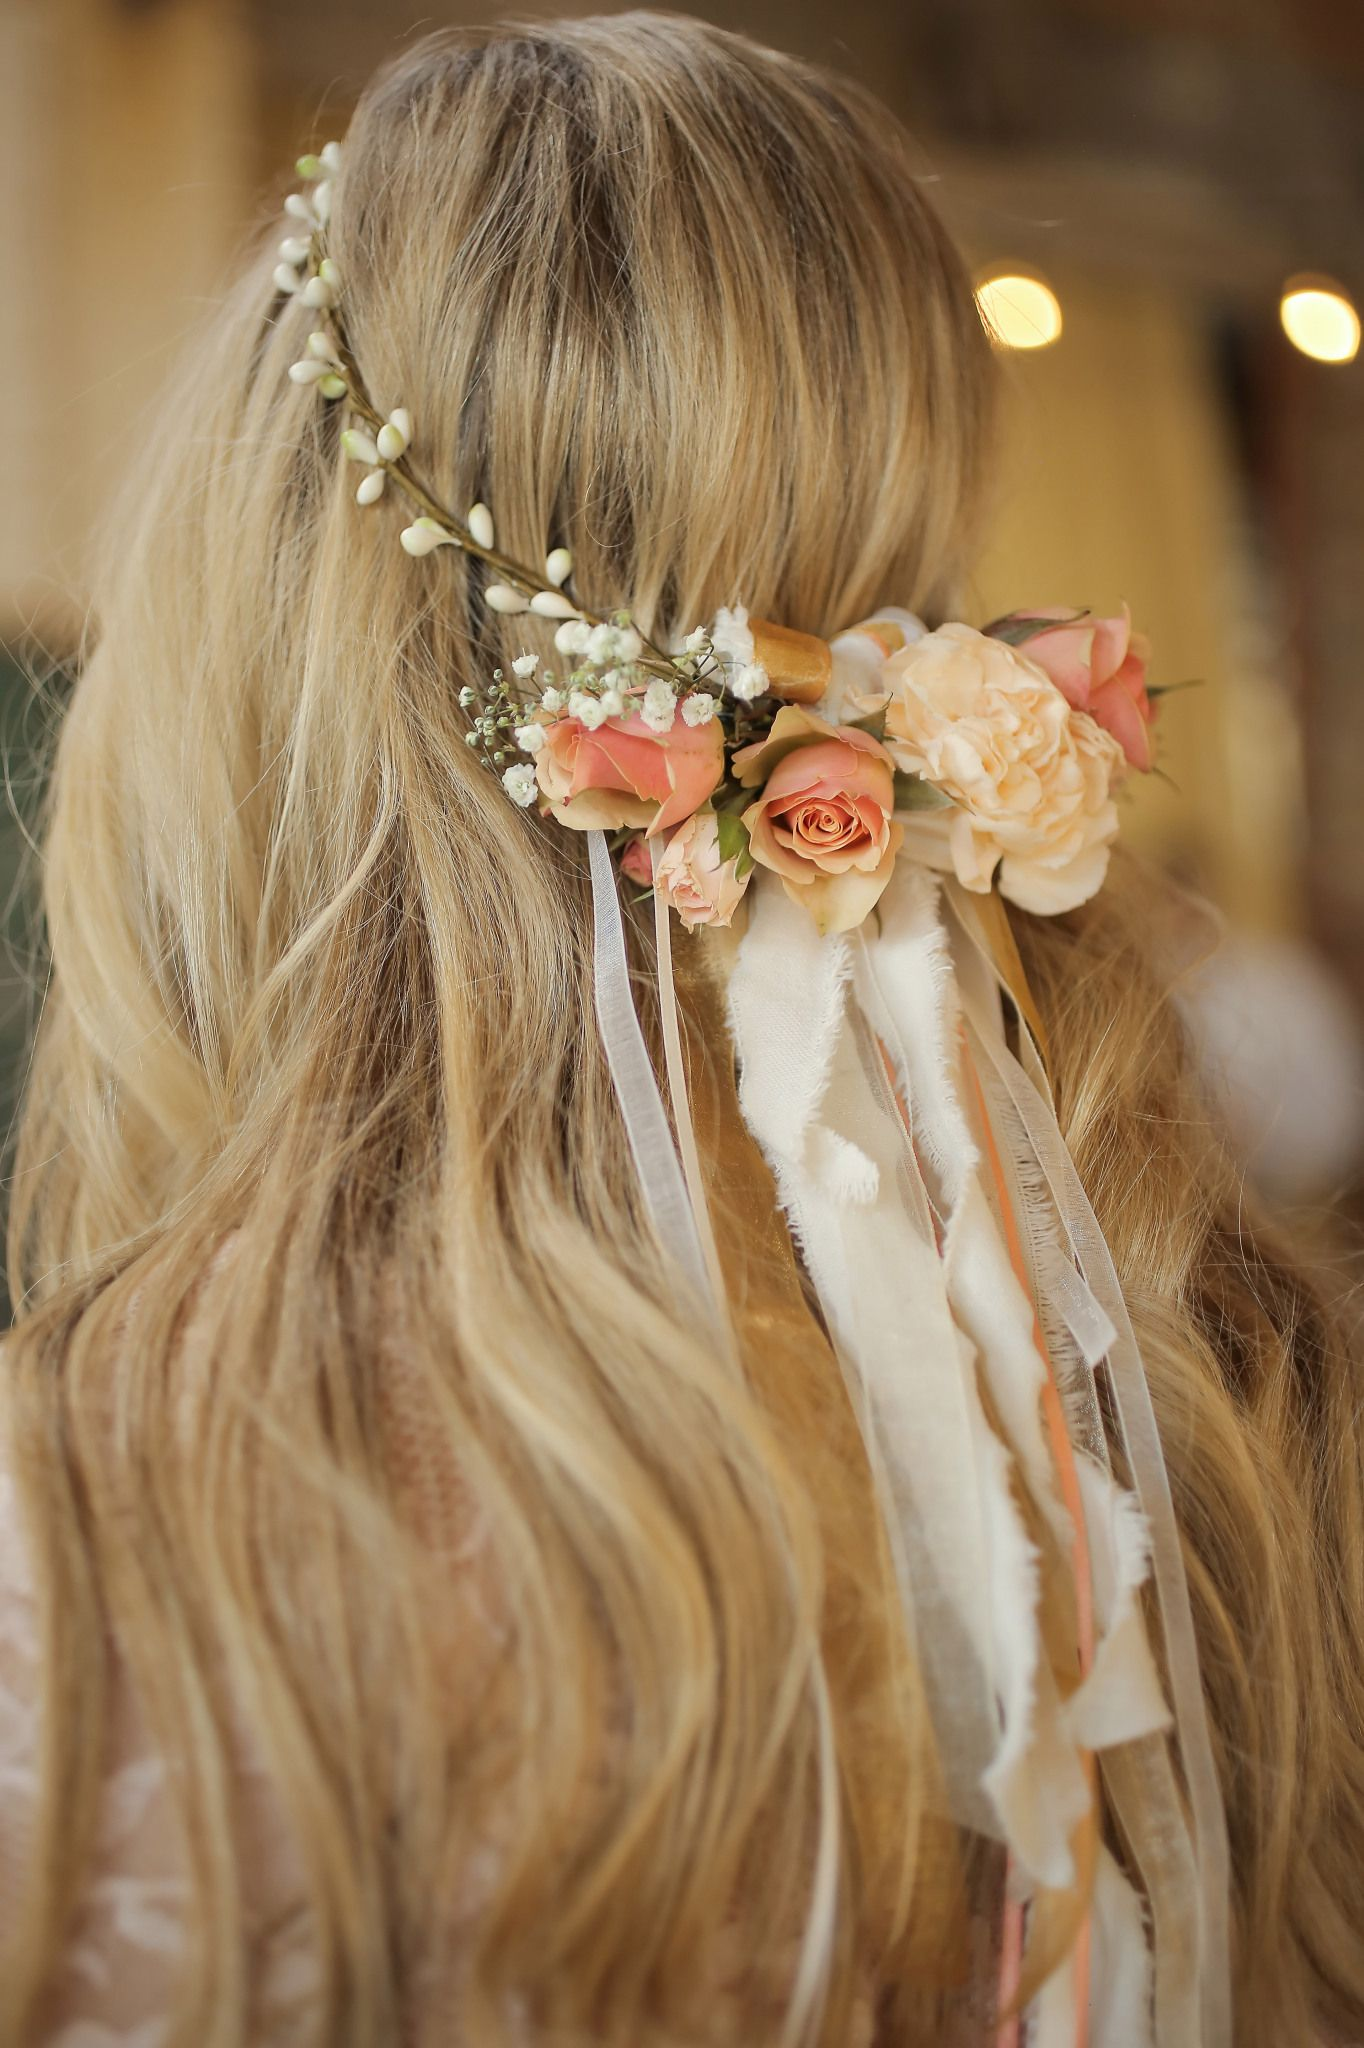 Bridesmaid Hair Wreath Flower Crown Bride Bride